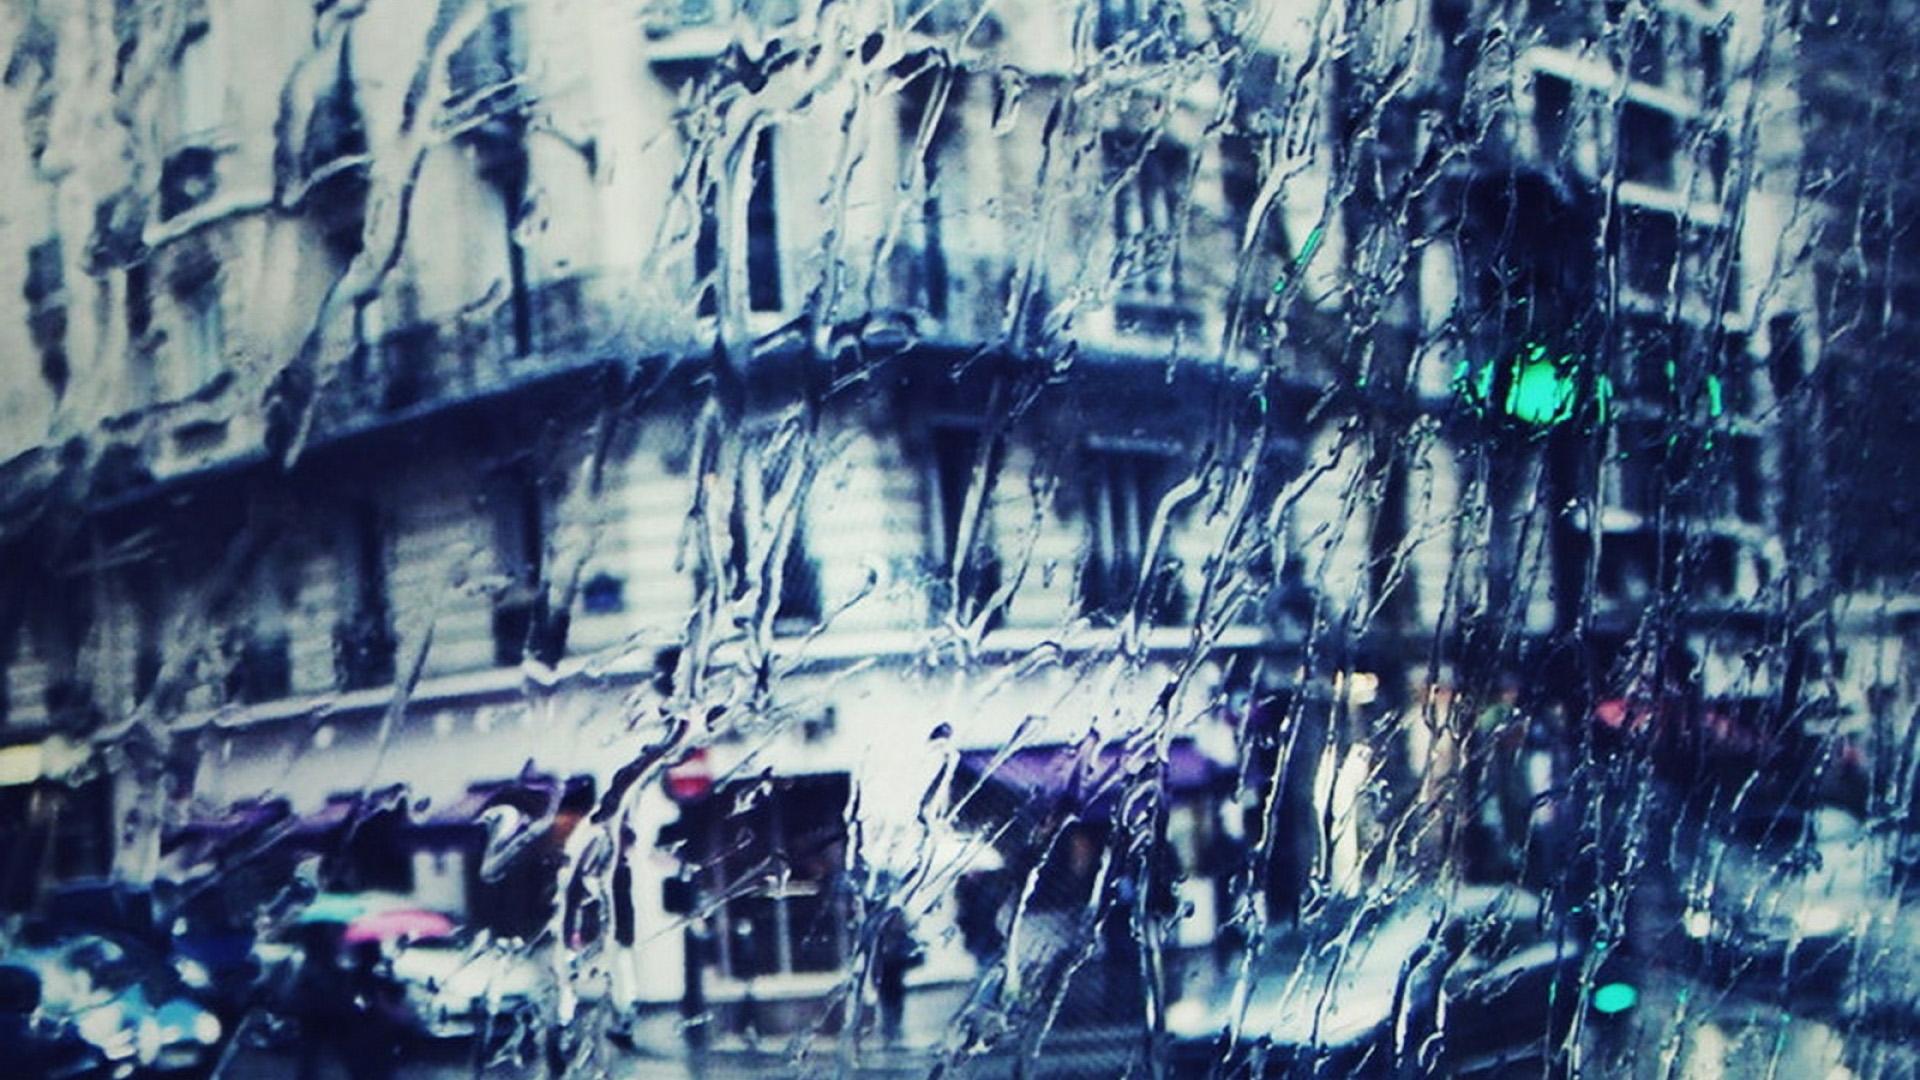 city_rain_light_glass_building_54388_1920x1080